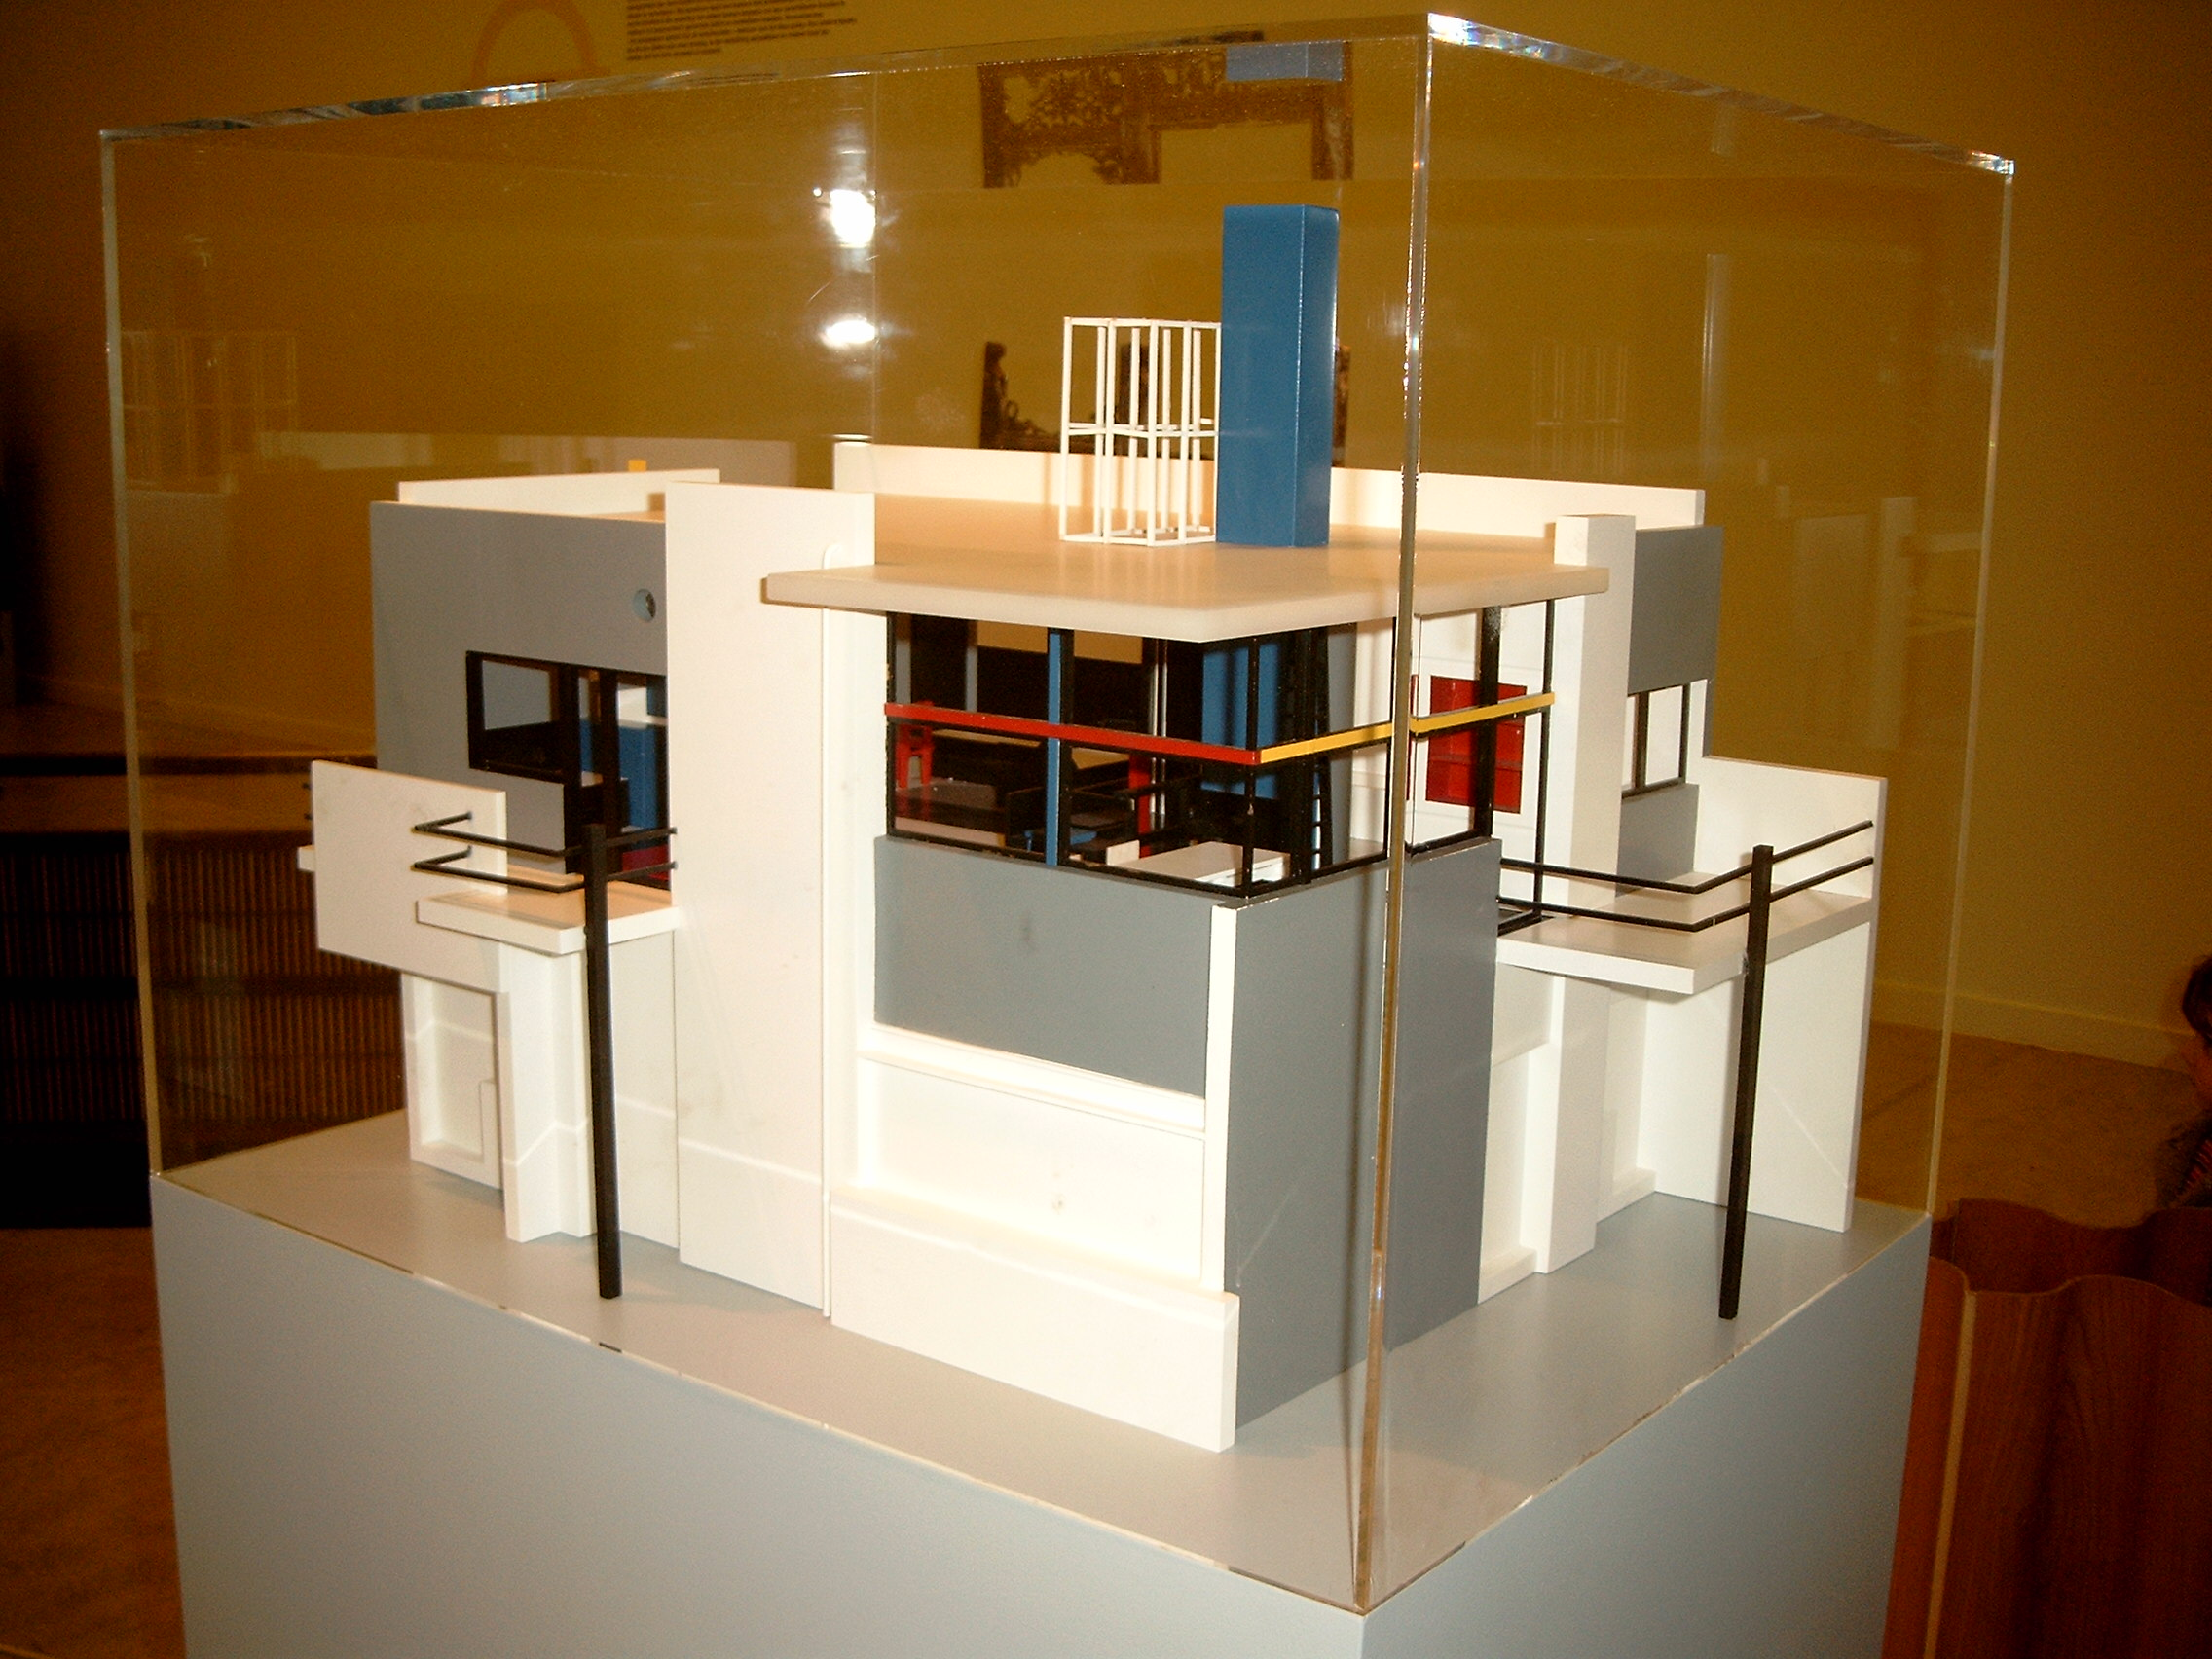 AP Rietveld Schroder House